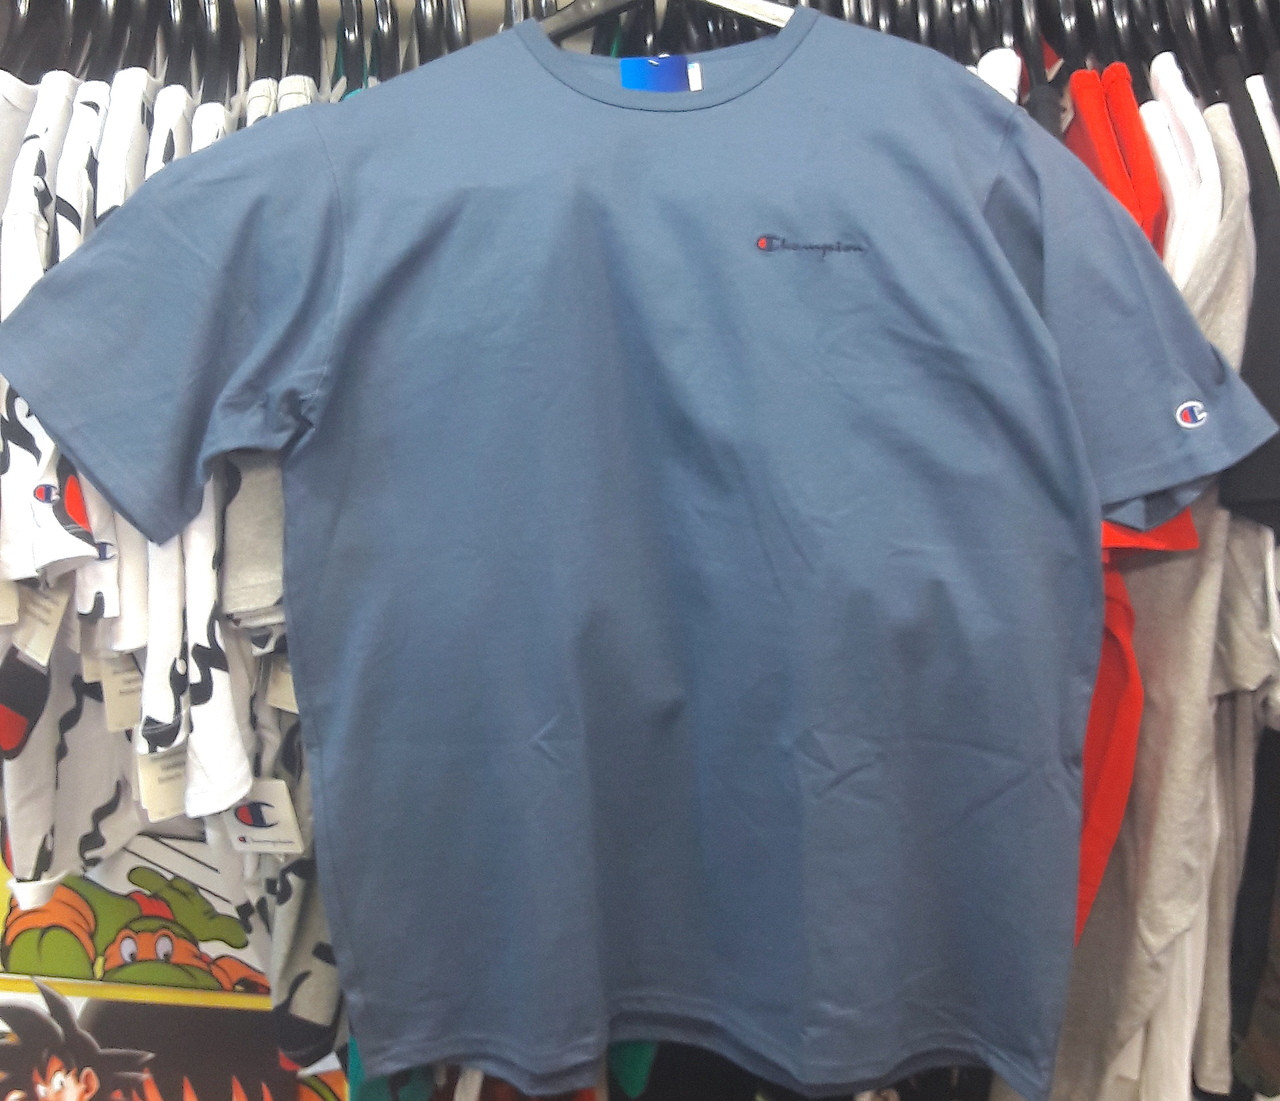 25a15717b16 Champion Clothing. $47.18. Champion Heritage Small Script Blue T-Shirt